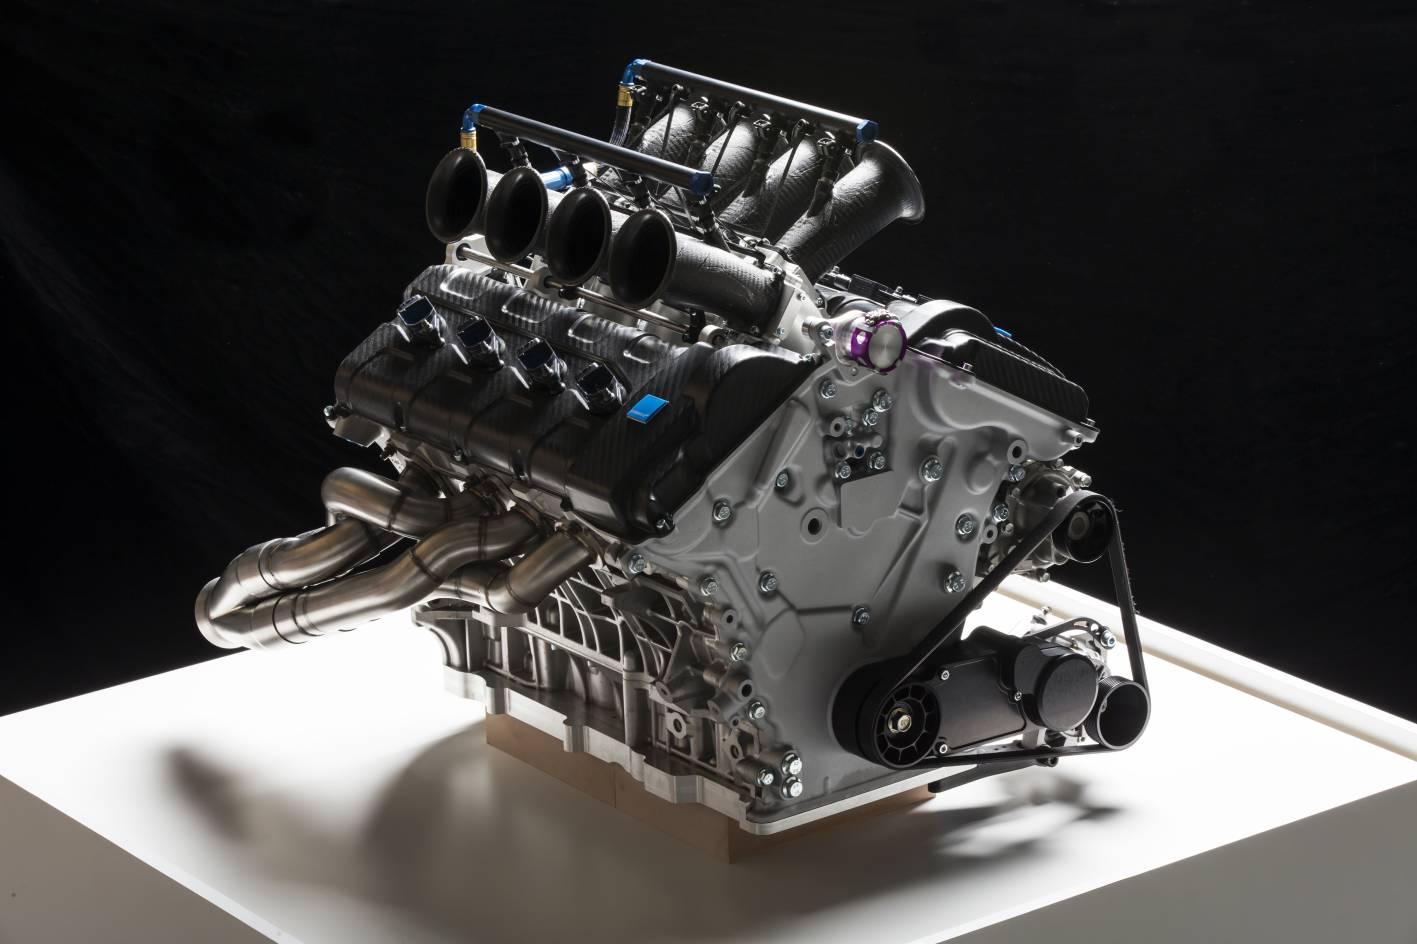 Volvo S60 V8 Supercar engine revealed | PerformanceDrive